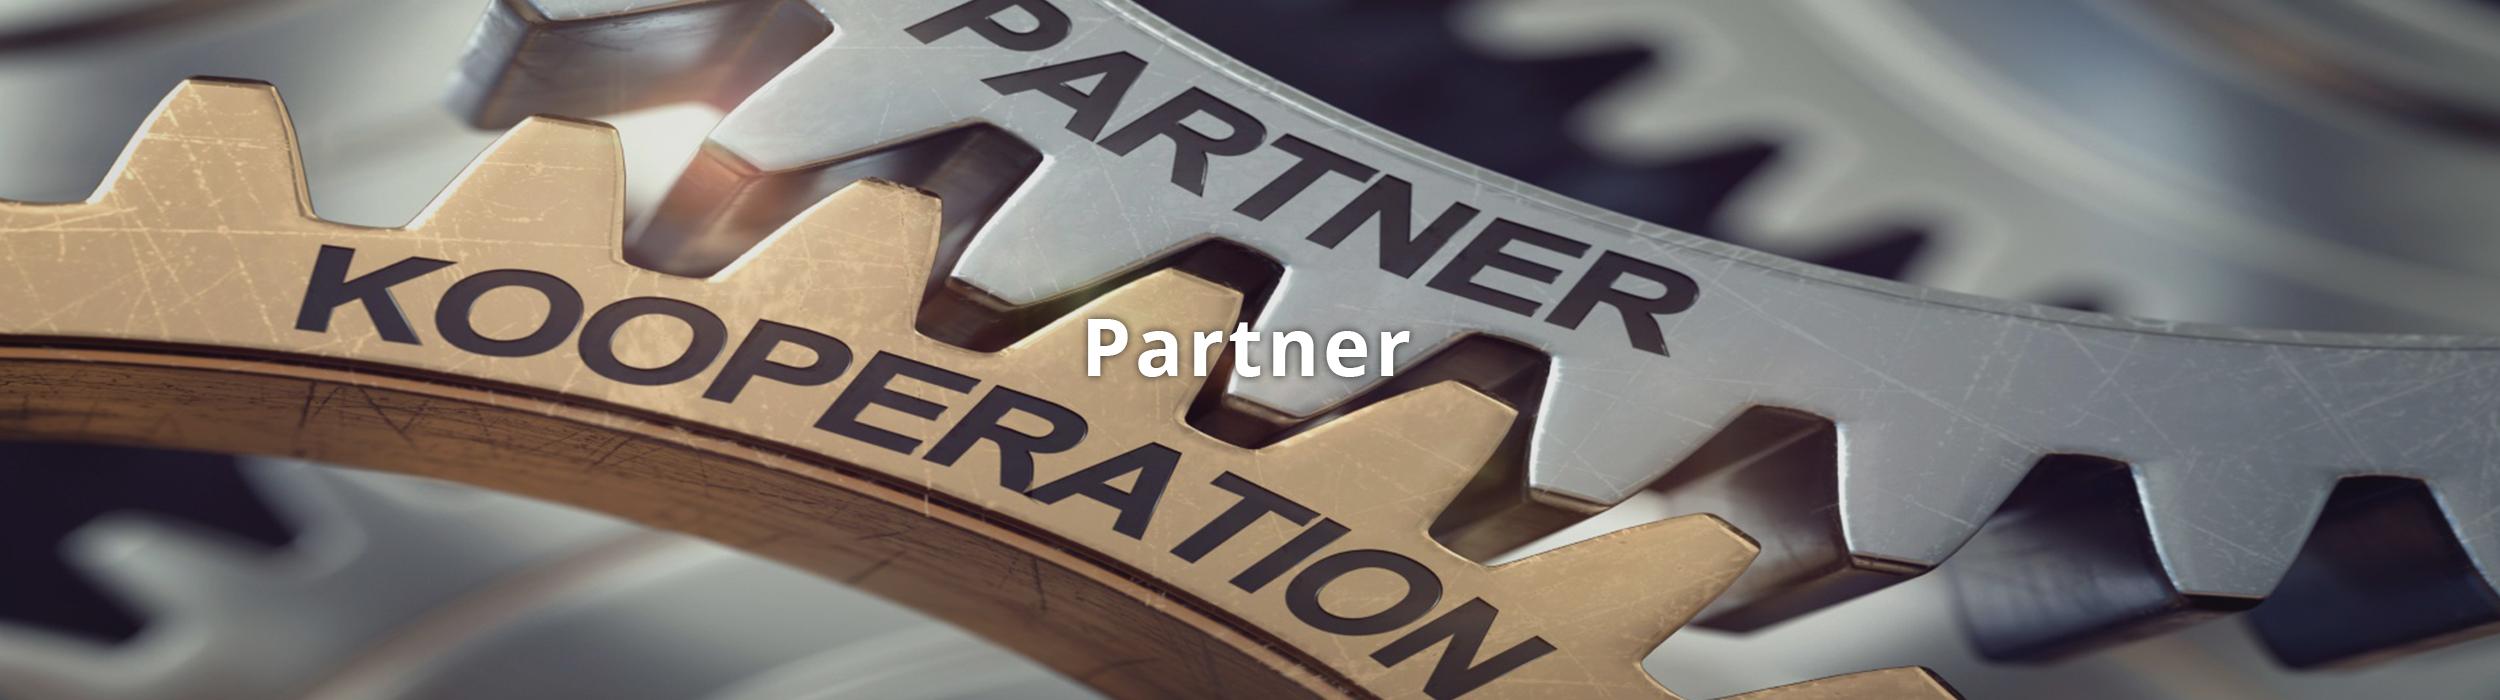 nauv_partner